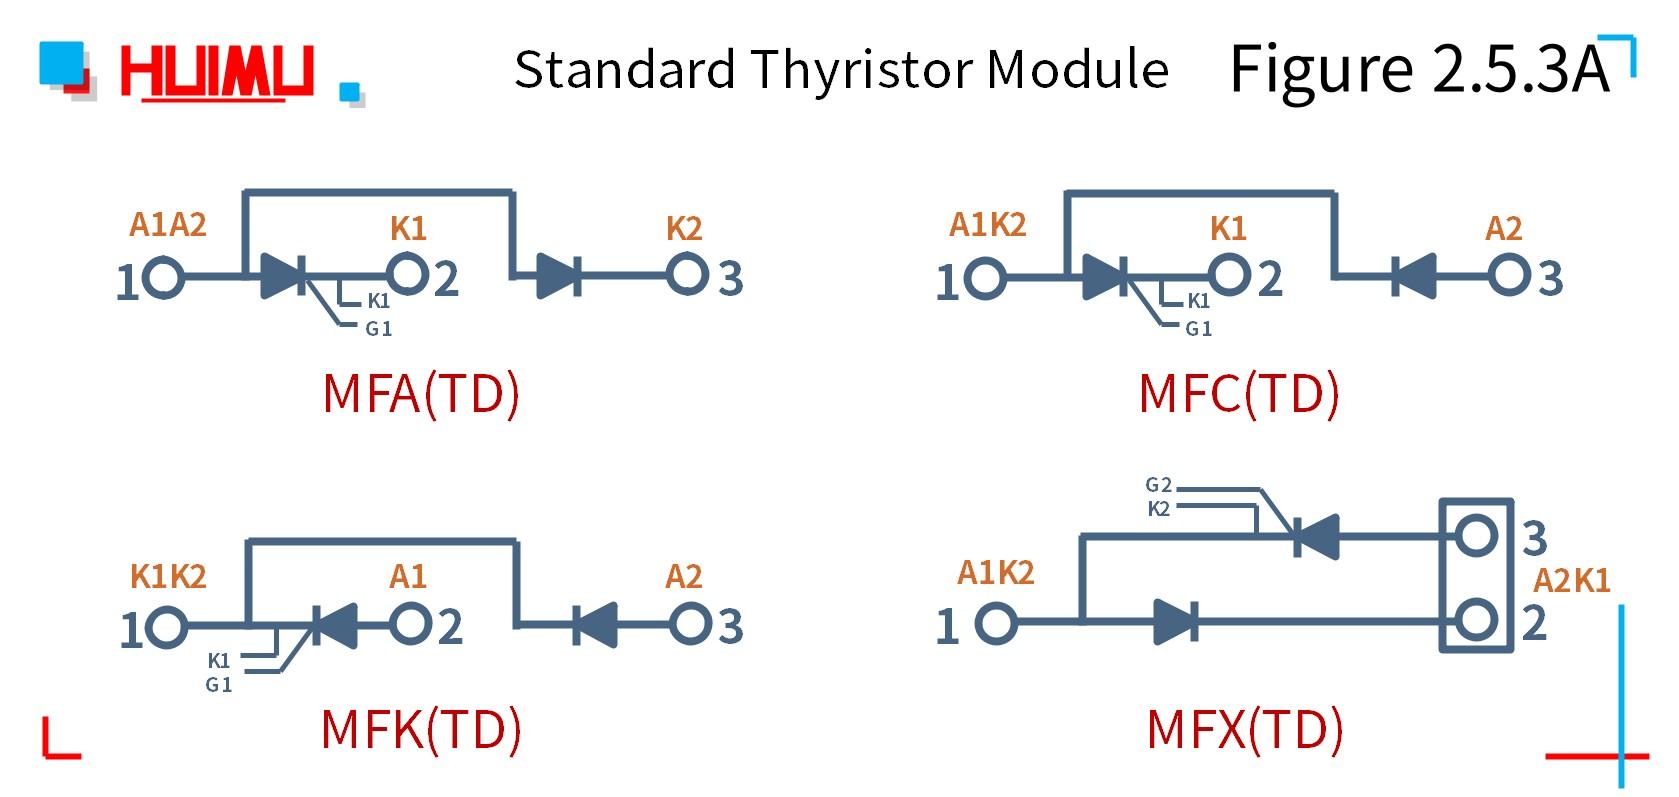 MGR_mager_MFx(TD)_series_standard_thyristor-rectifier_hybrid_module_citcuit_wiring_diagram